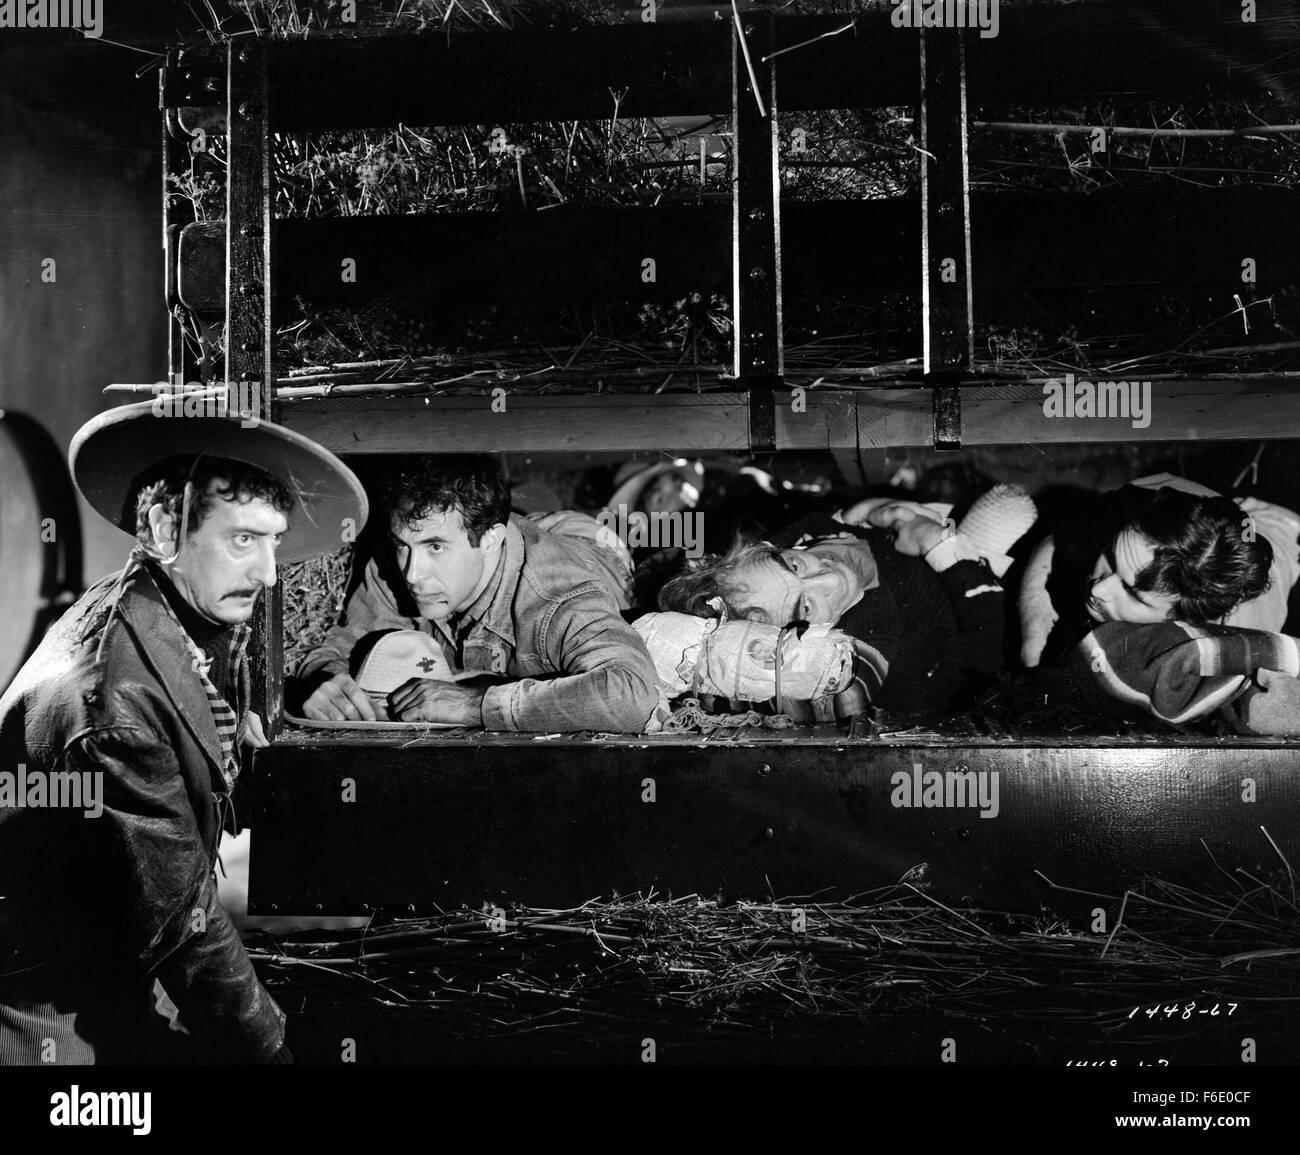 RELEASE DATE: October 28, 1949. MOVIE TITLE: Border Incident. STUDIO: Metro-Goldwyn-Mayer (MGM). PLOT: o penetrate Stock Photo